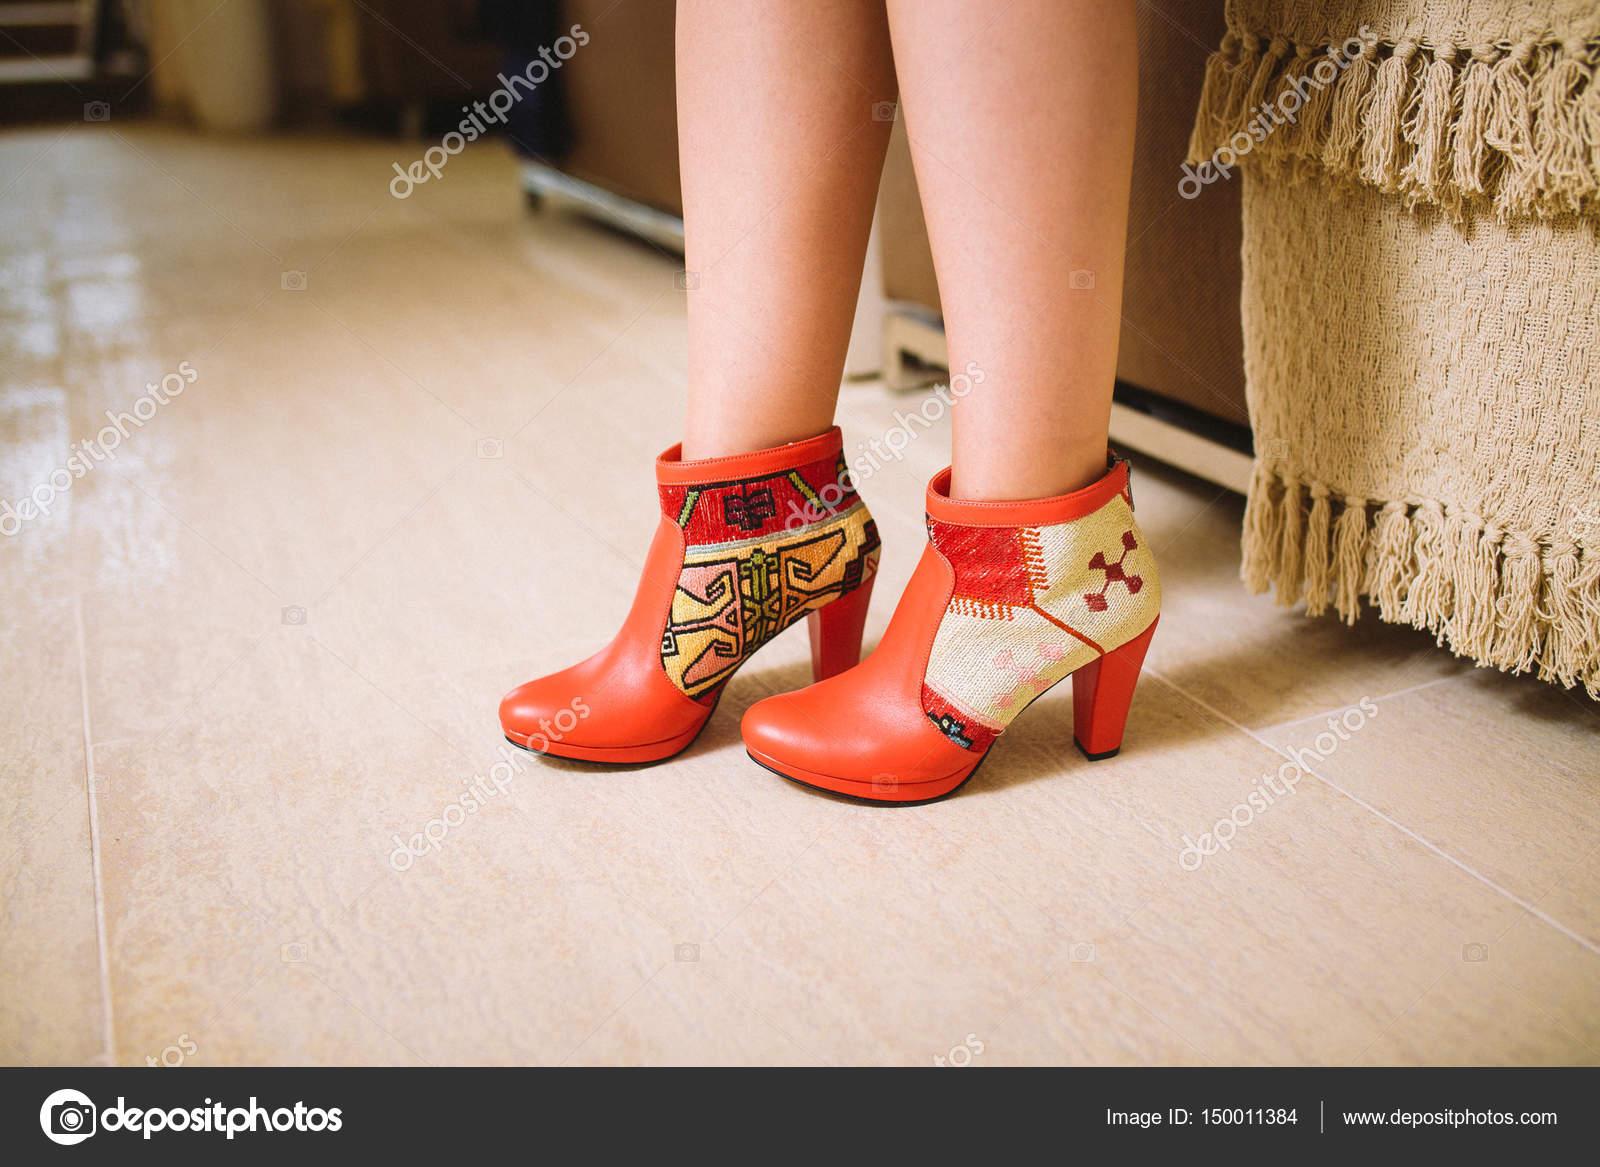 503cf1103e Lookbook γυναικεία πόδια σε μπότες κόκκινο Δερμάτινο χειροποίητο στο  εσωτερικό — Εικόνα από ...